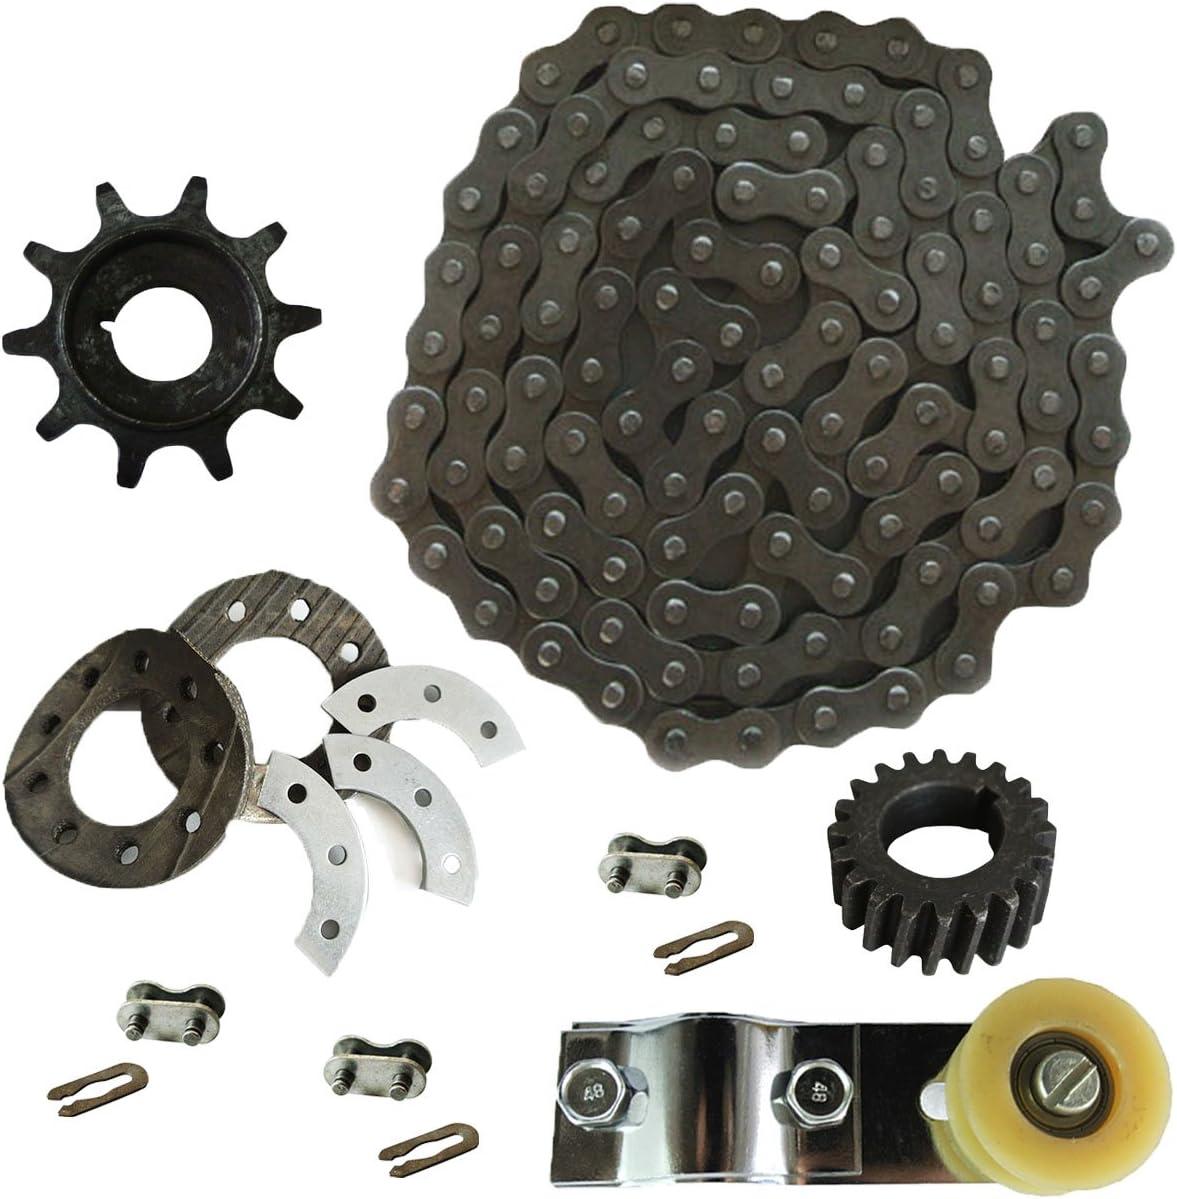 415 Chain,Sprocket Mount Kit,Chain Tensioner fits 49cc 66cc 80cc Motorized Bike